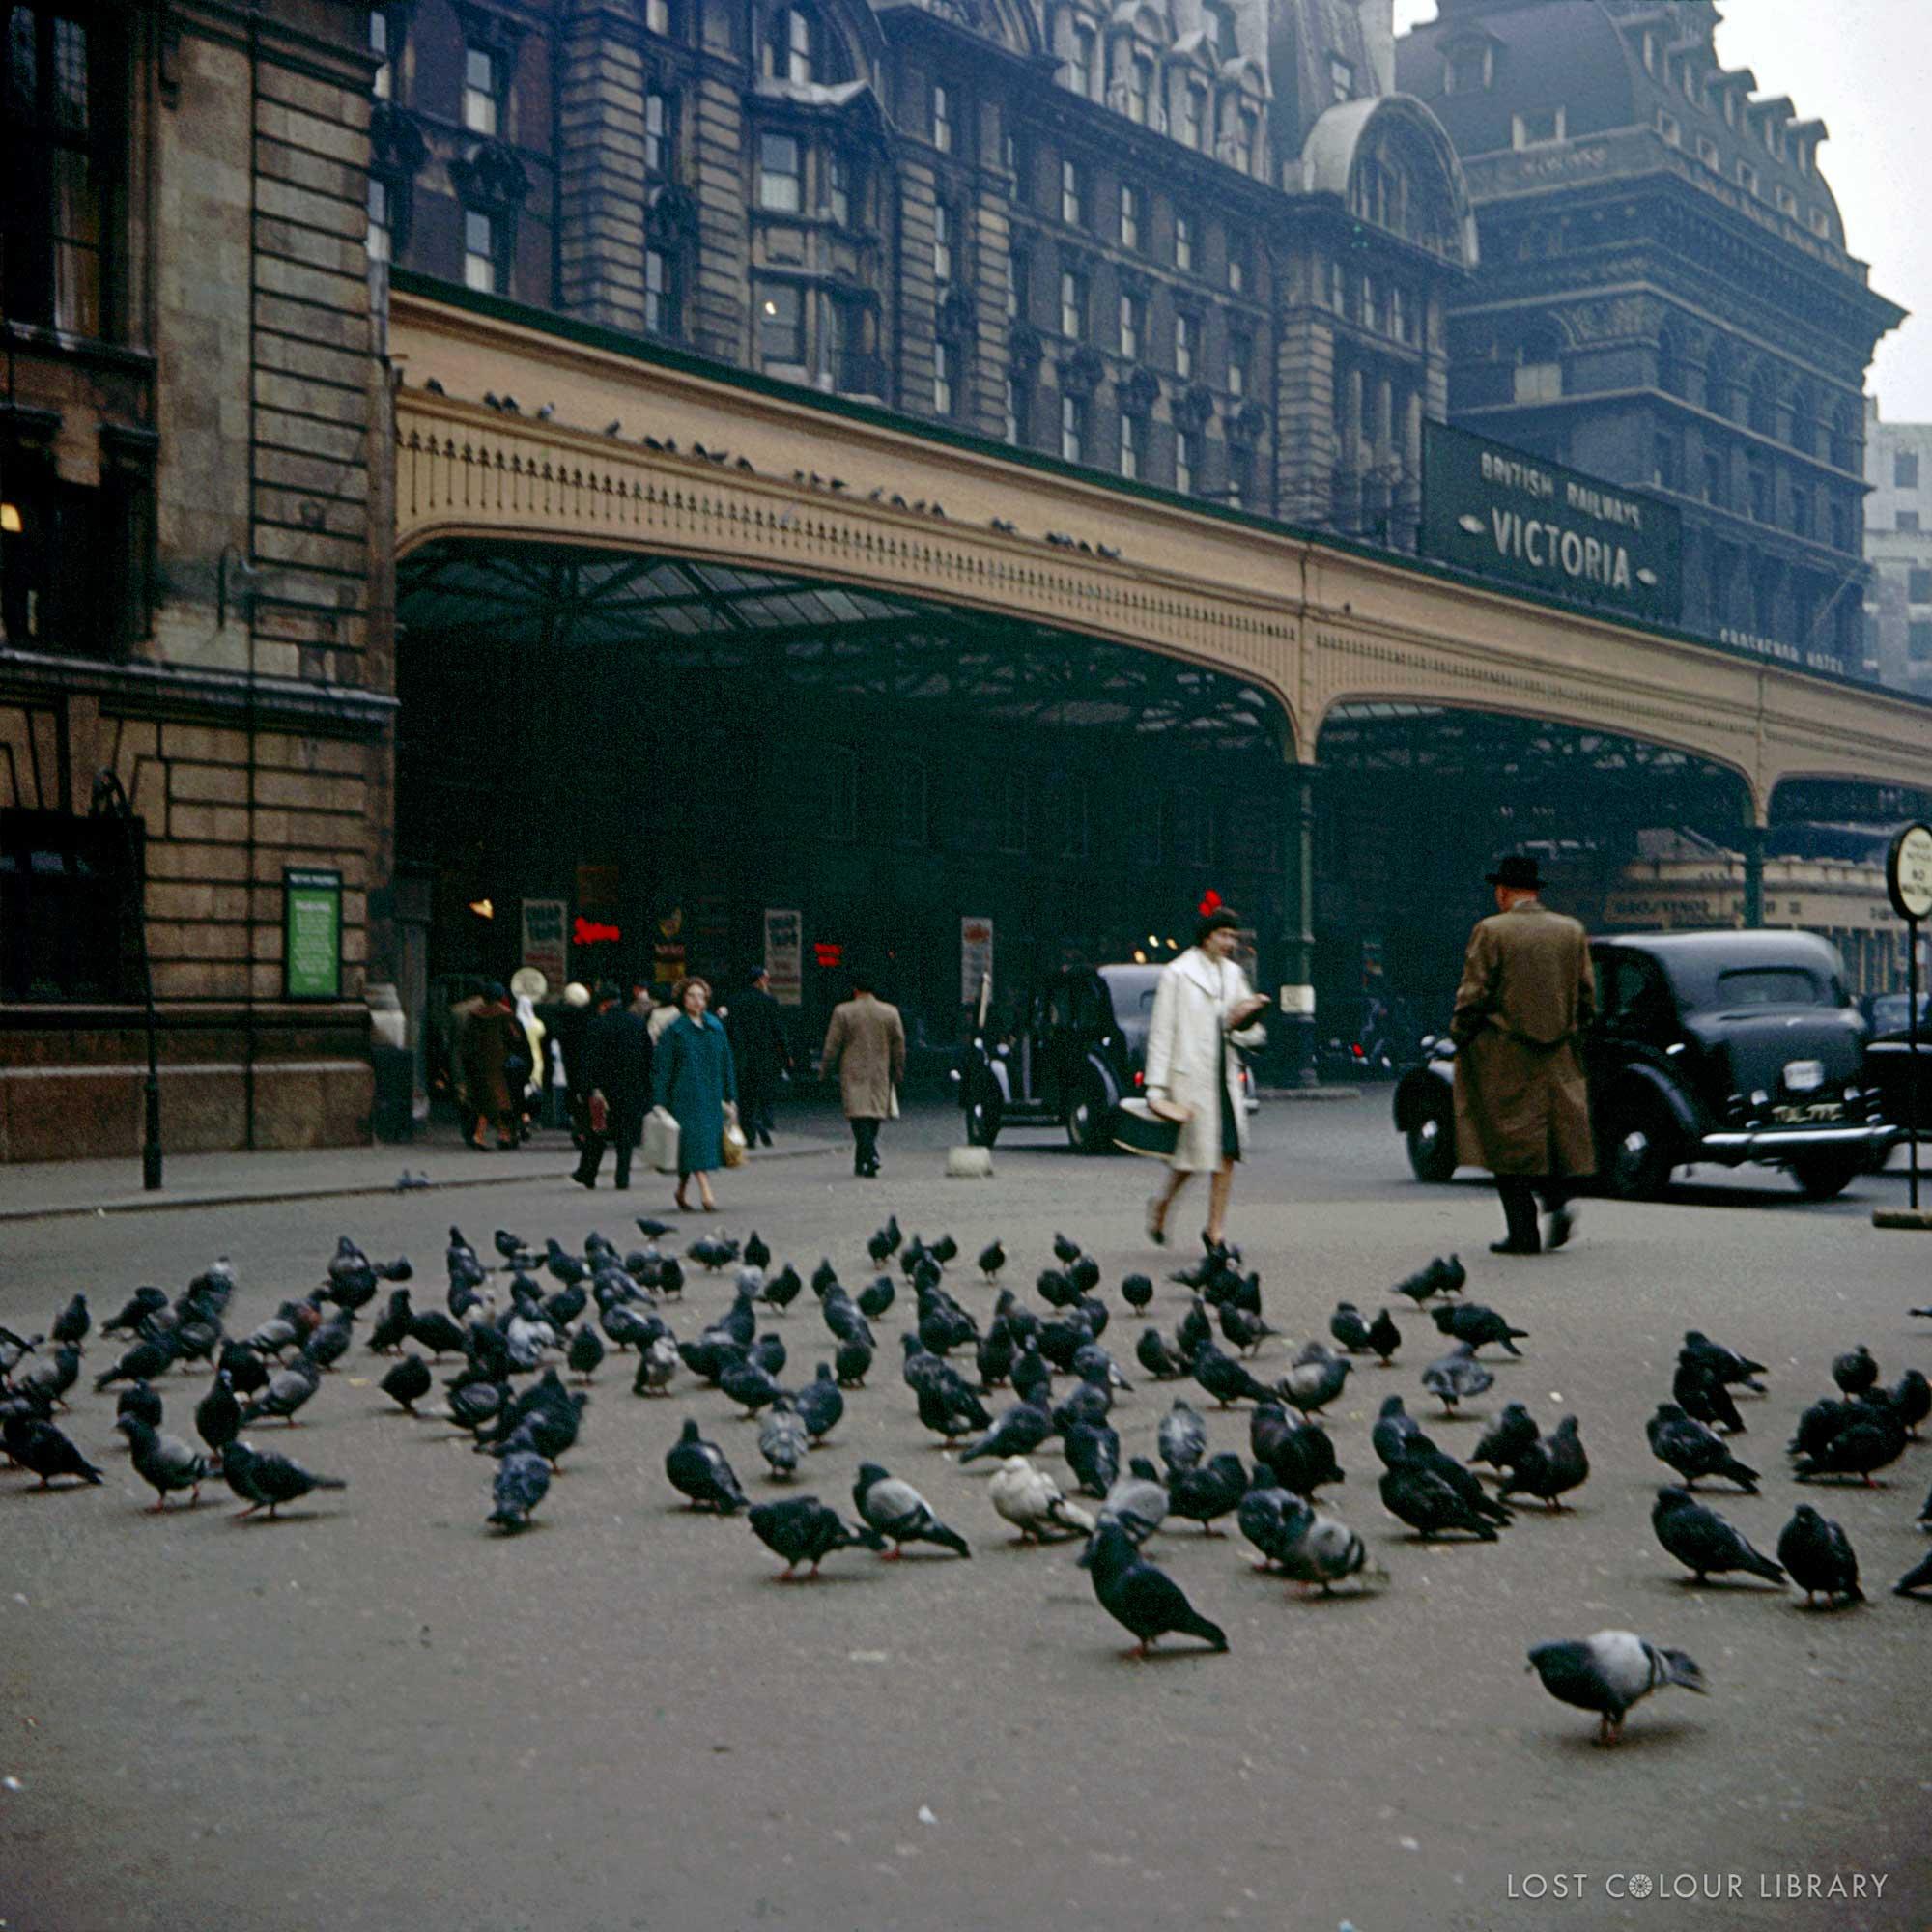 lcl-ww-victoria-station-1960-site-wm.jpg